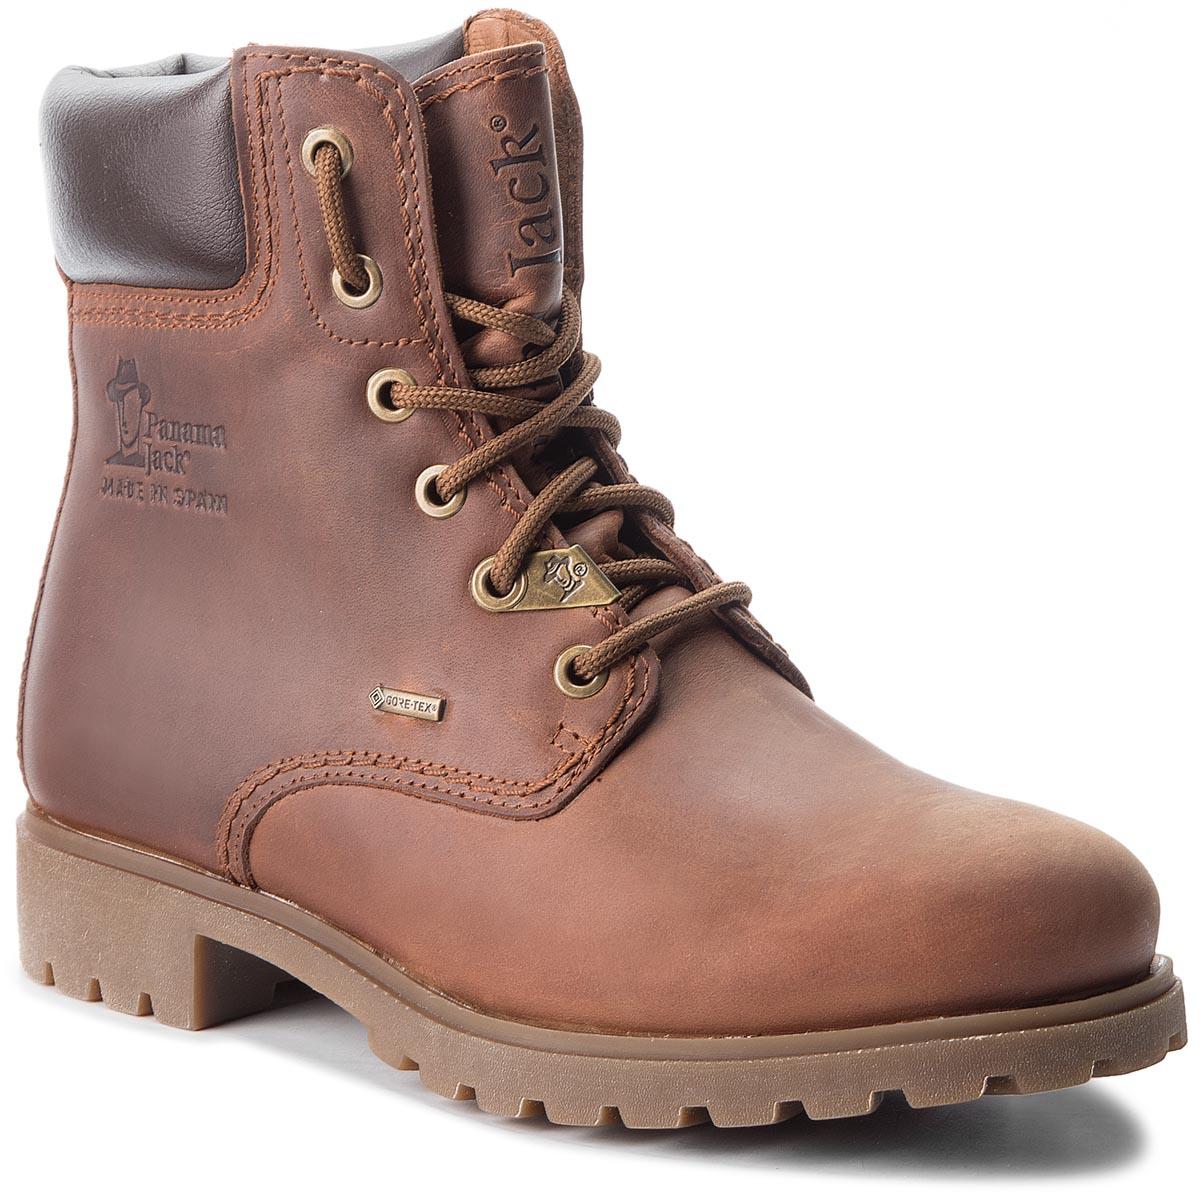 3dfee285ac2 Hiking Boots PANAMA JACK - Felicia B3 Napa Grass Cuero/Bark ...